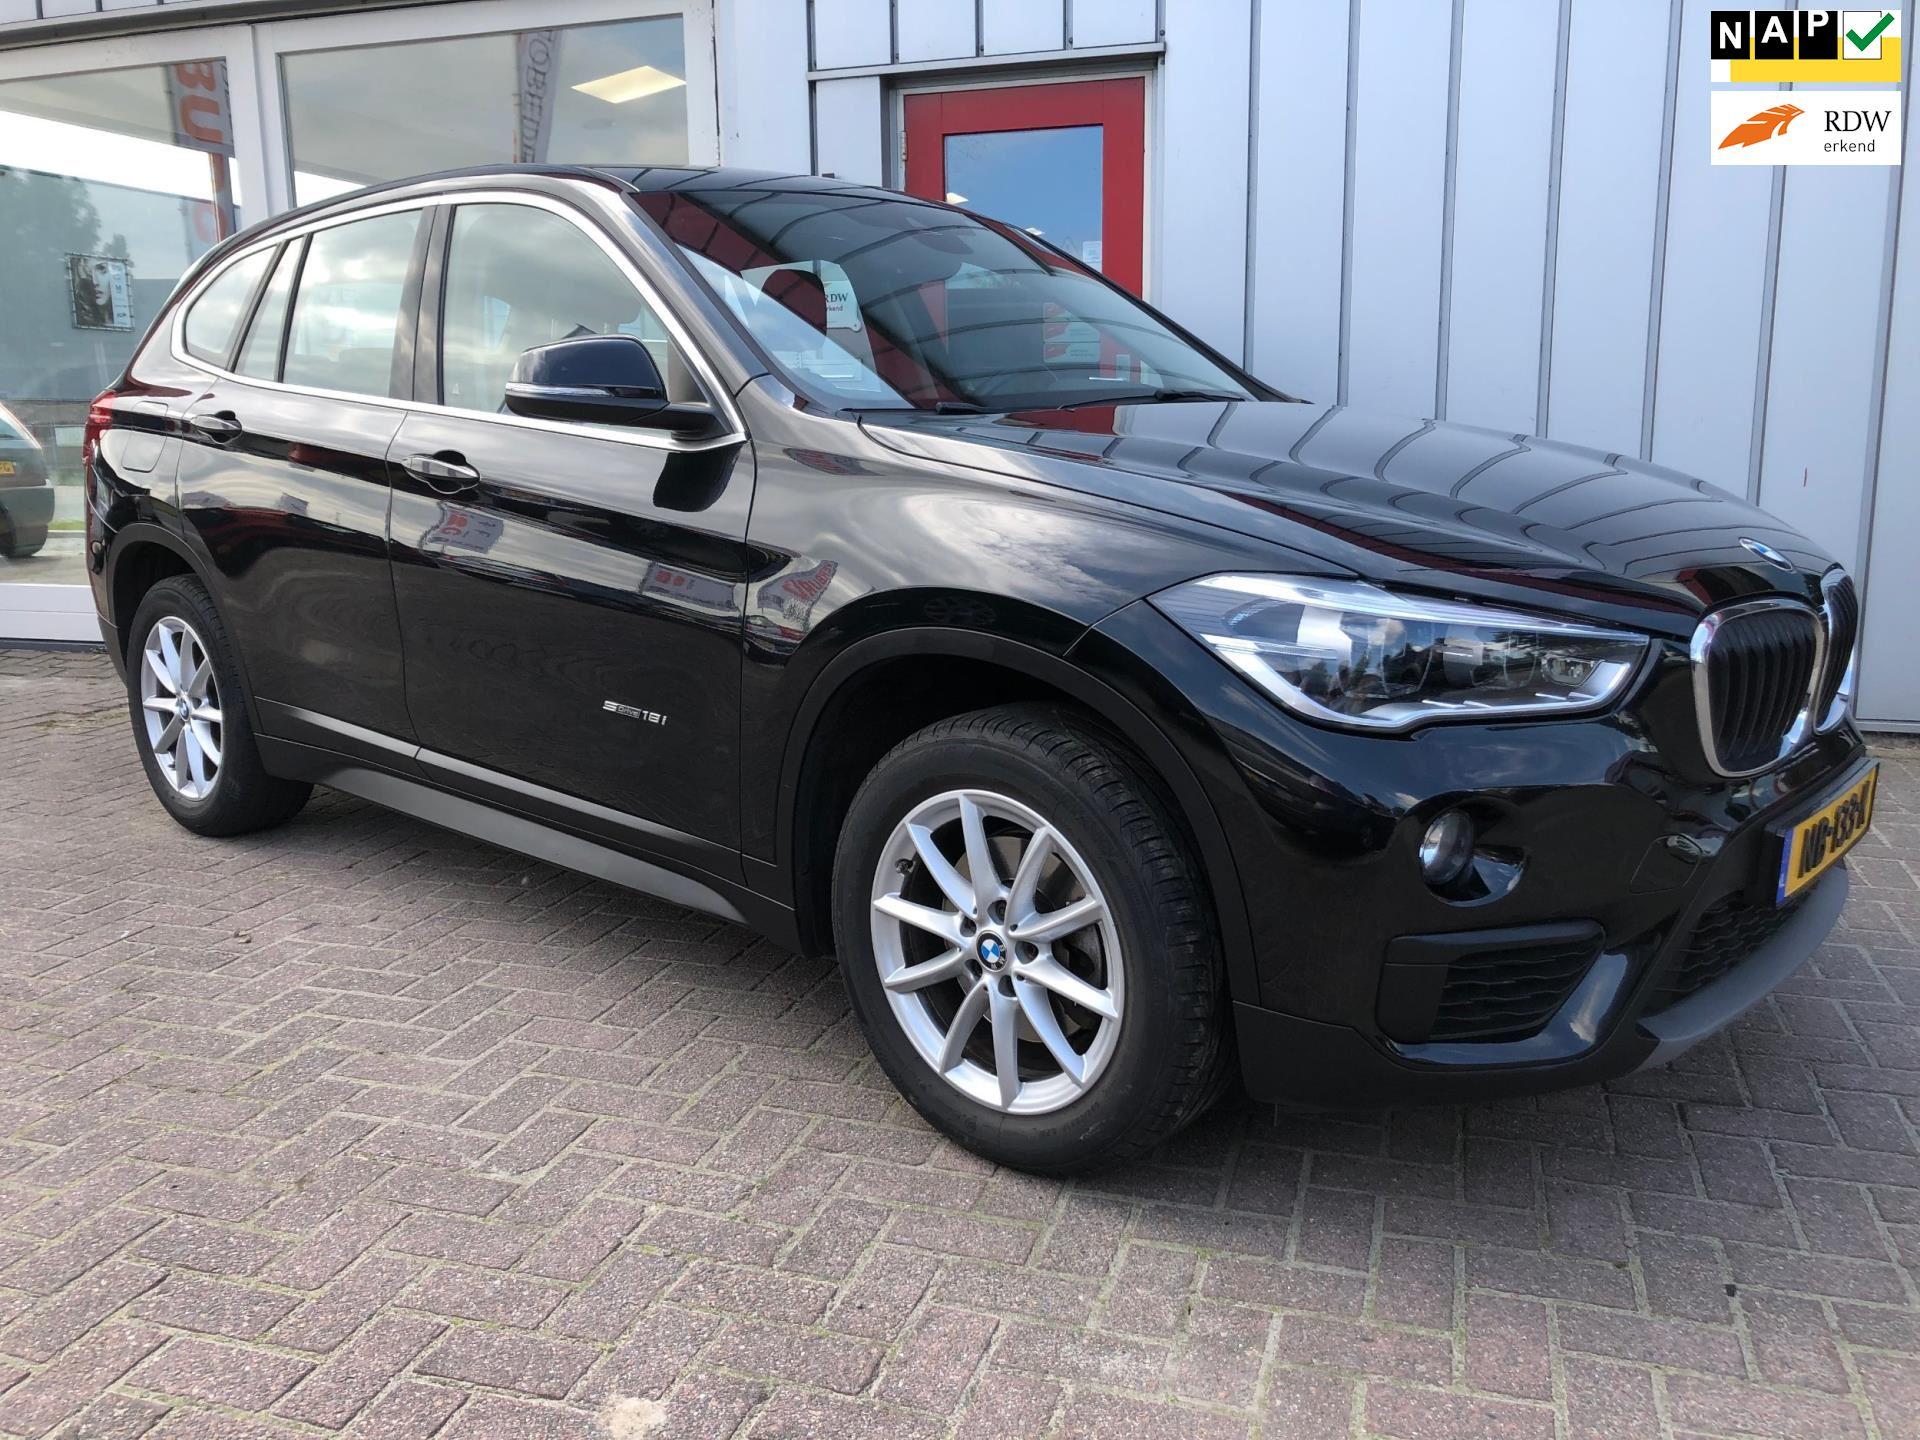 BMW X1 occasion - MKB Autobeheer